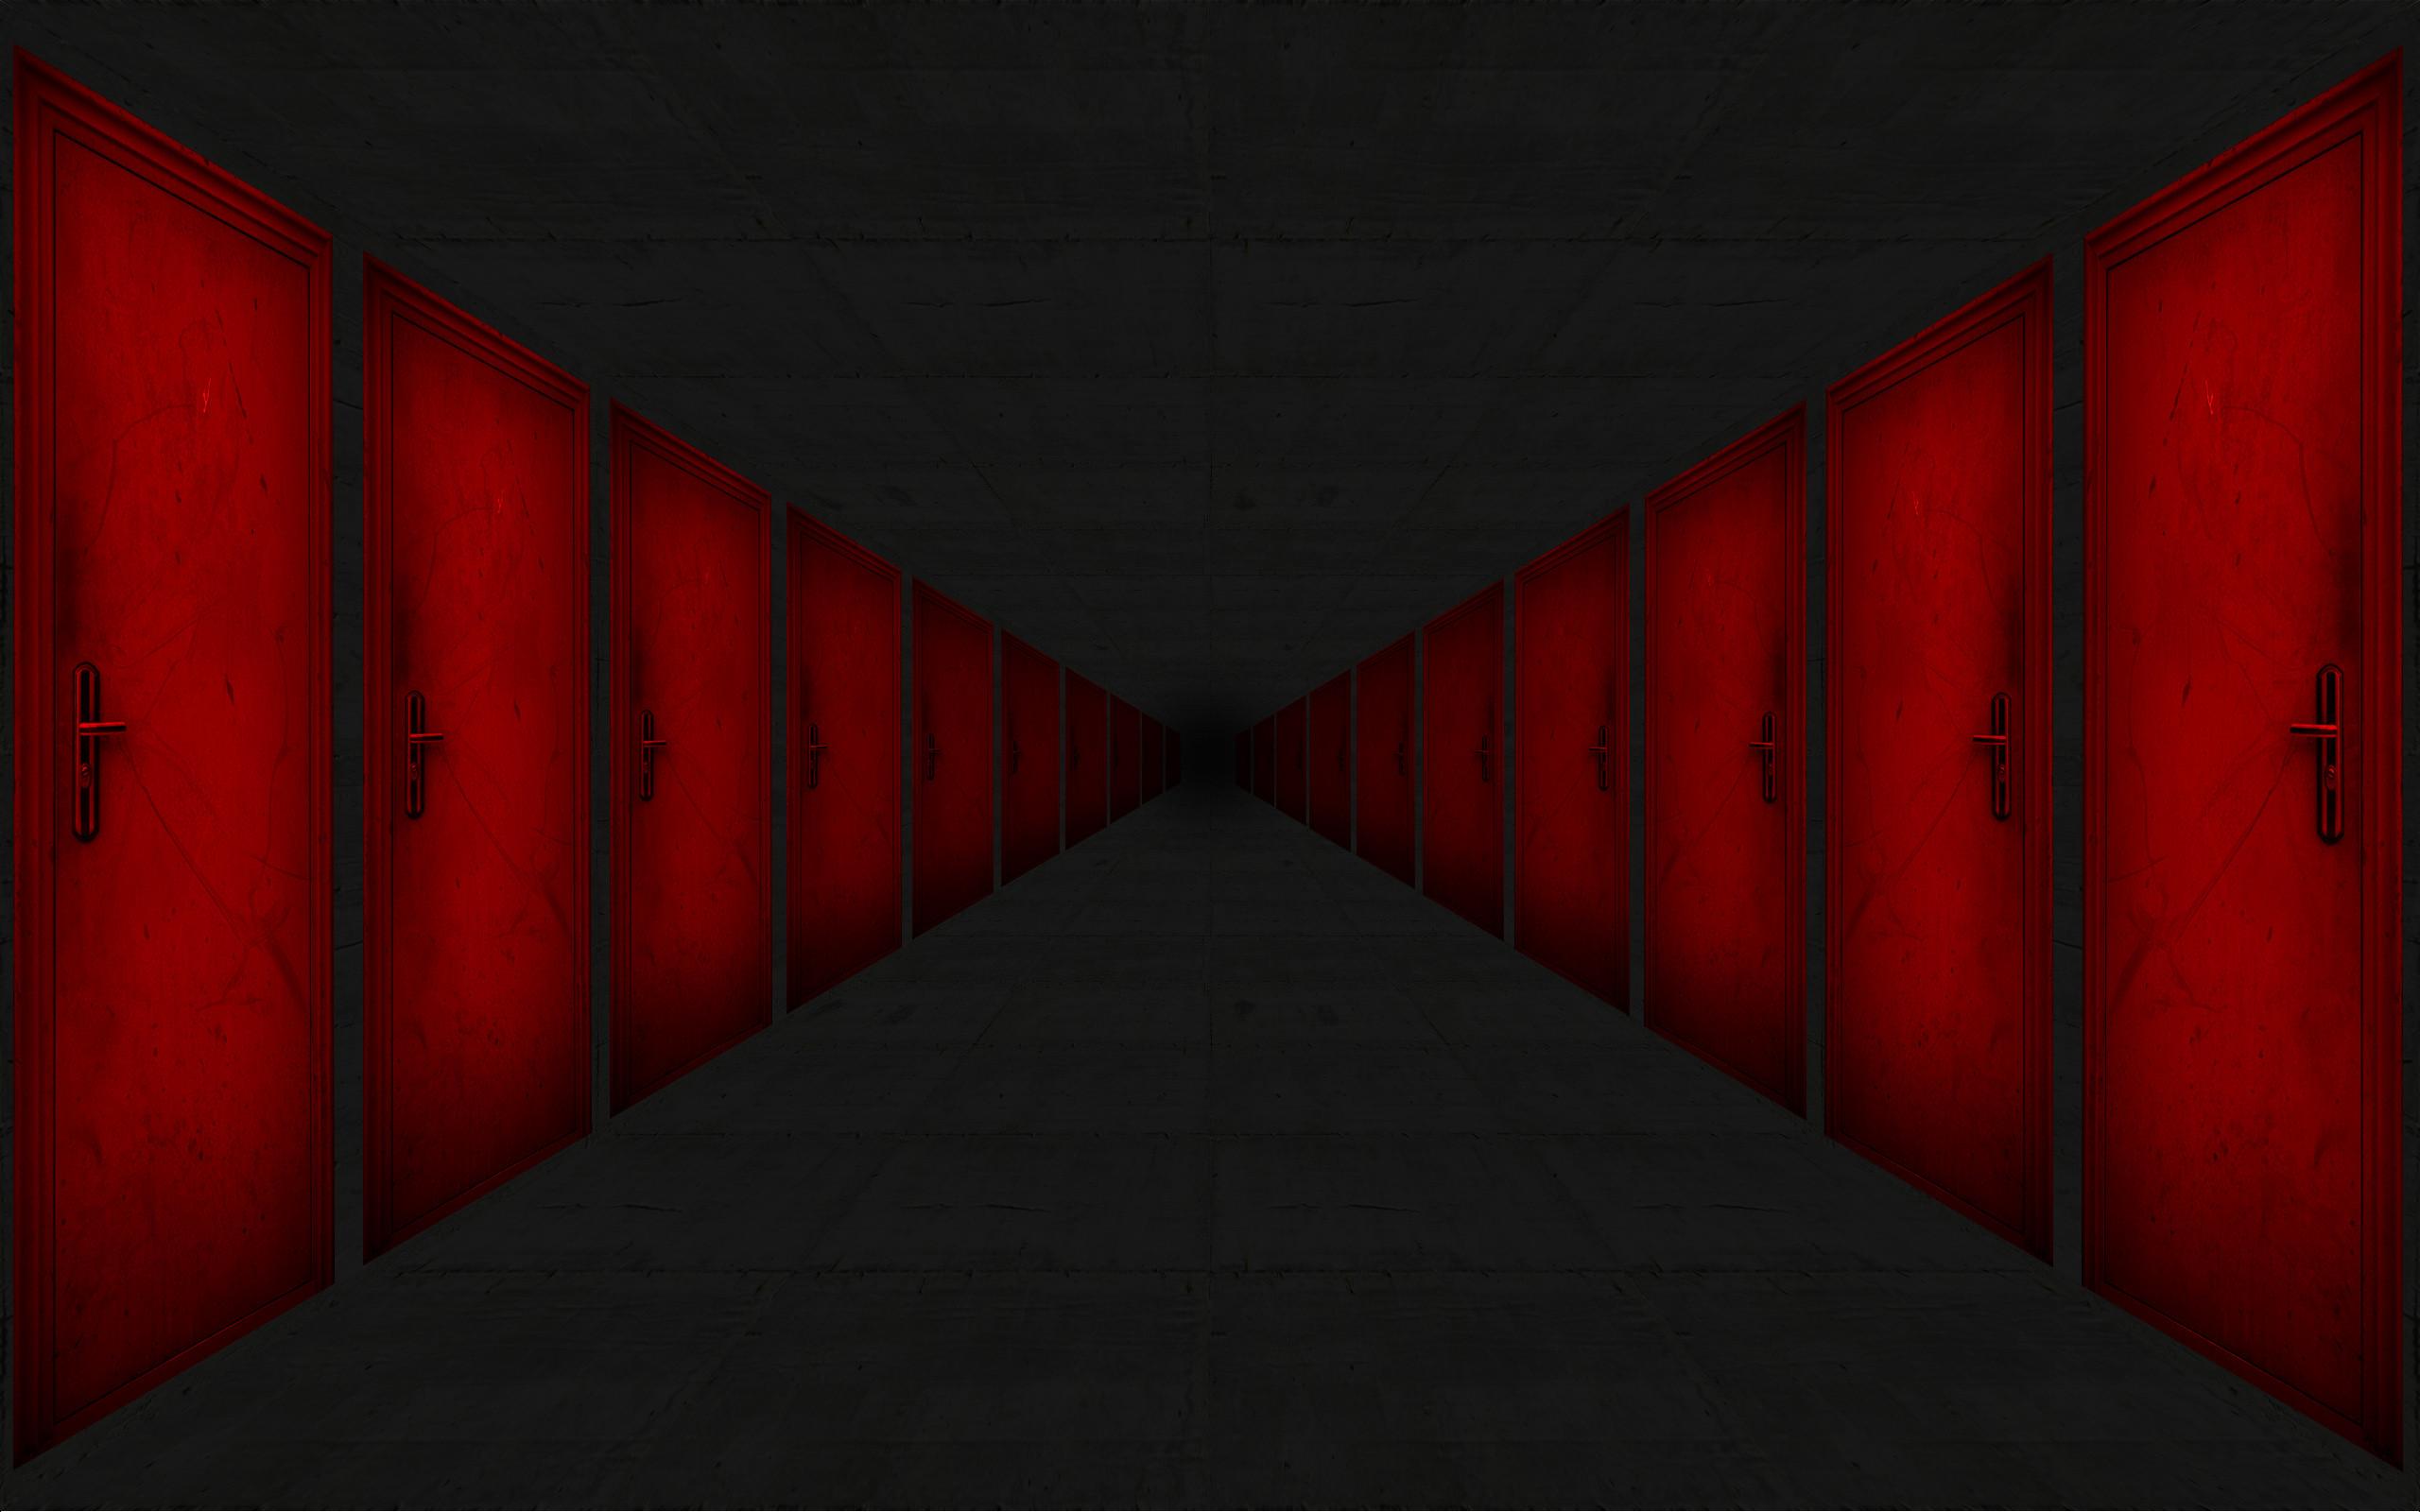 Iphone Wallpaper Black And Red 28 Desktop Background